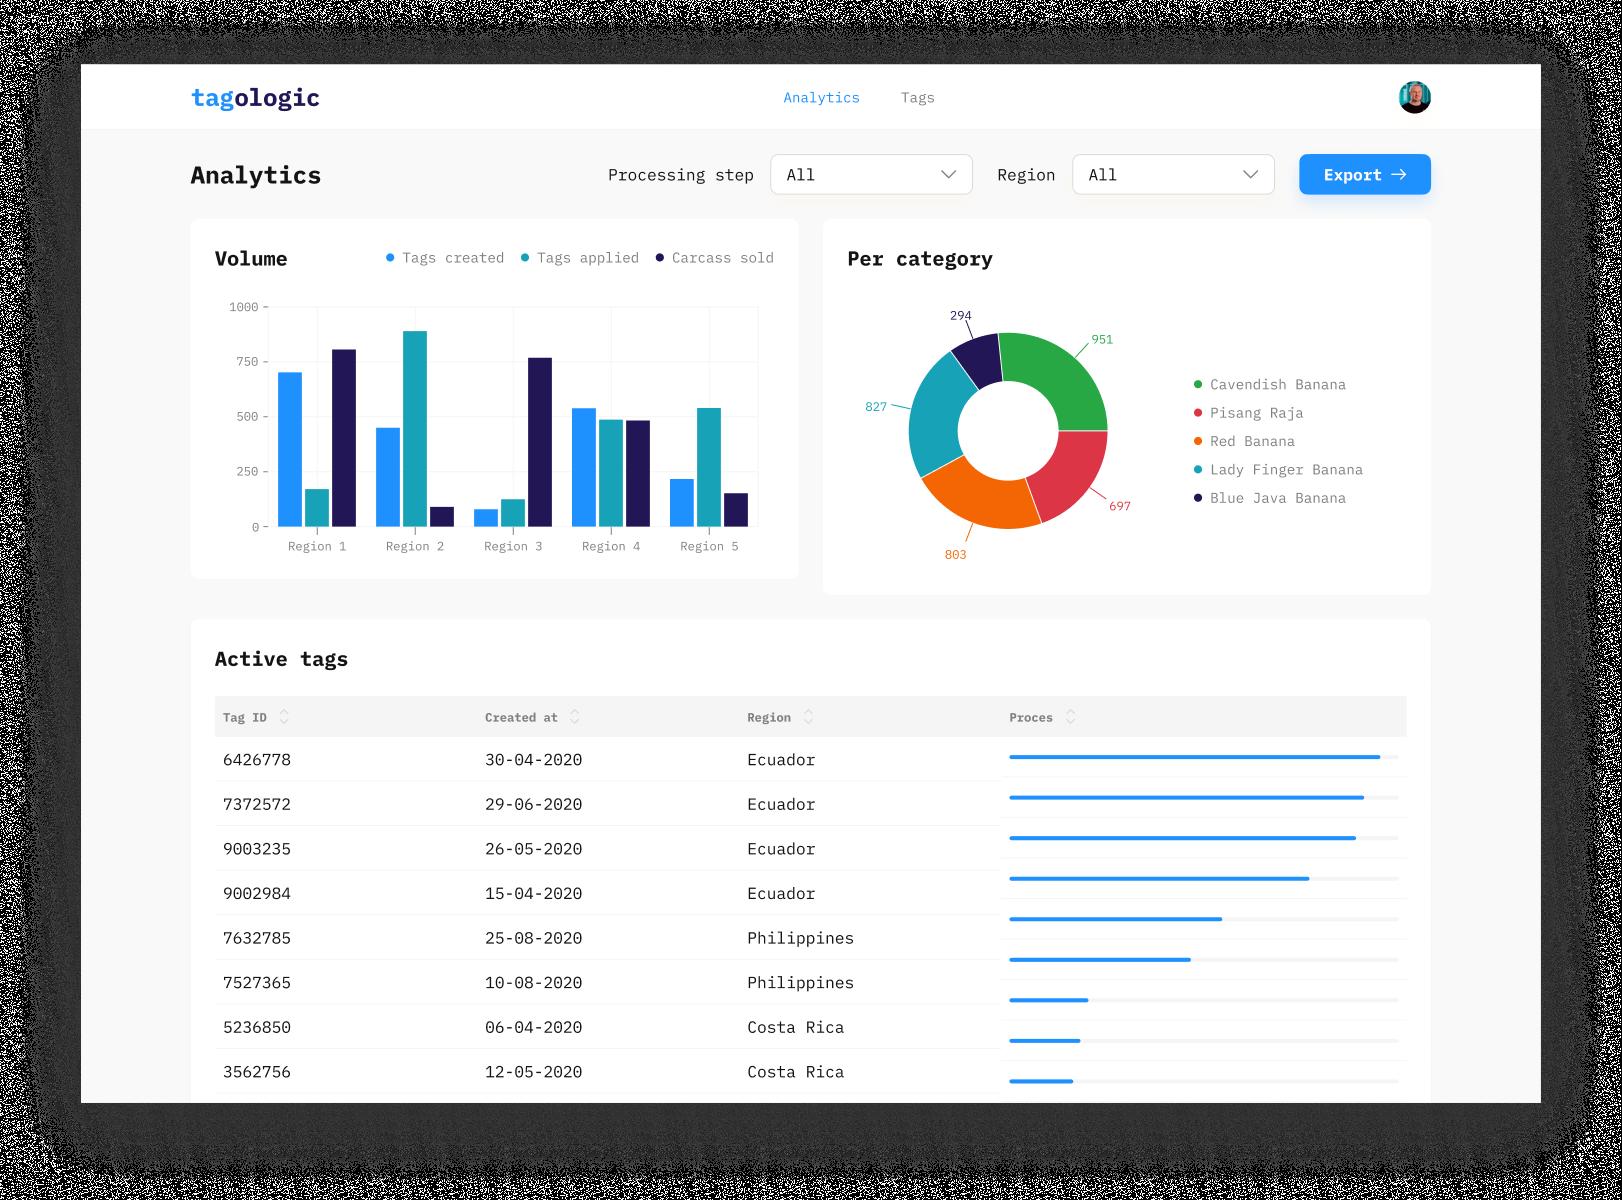 Tagologic web analytics dashboard